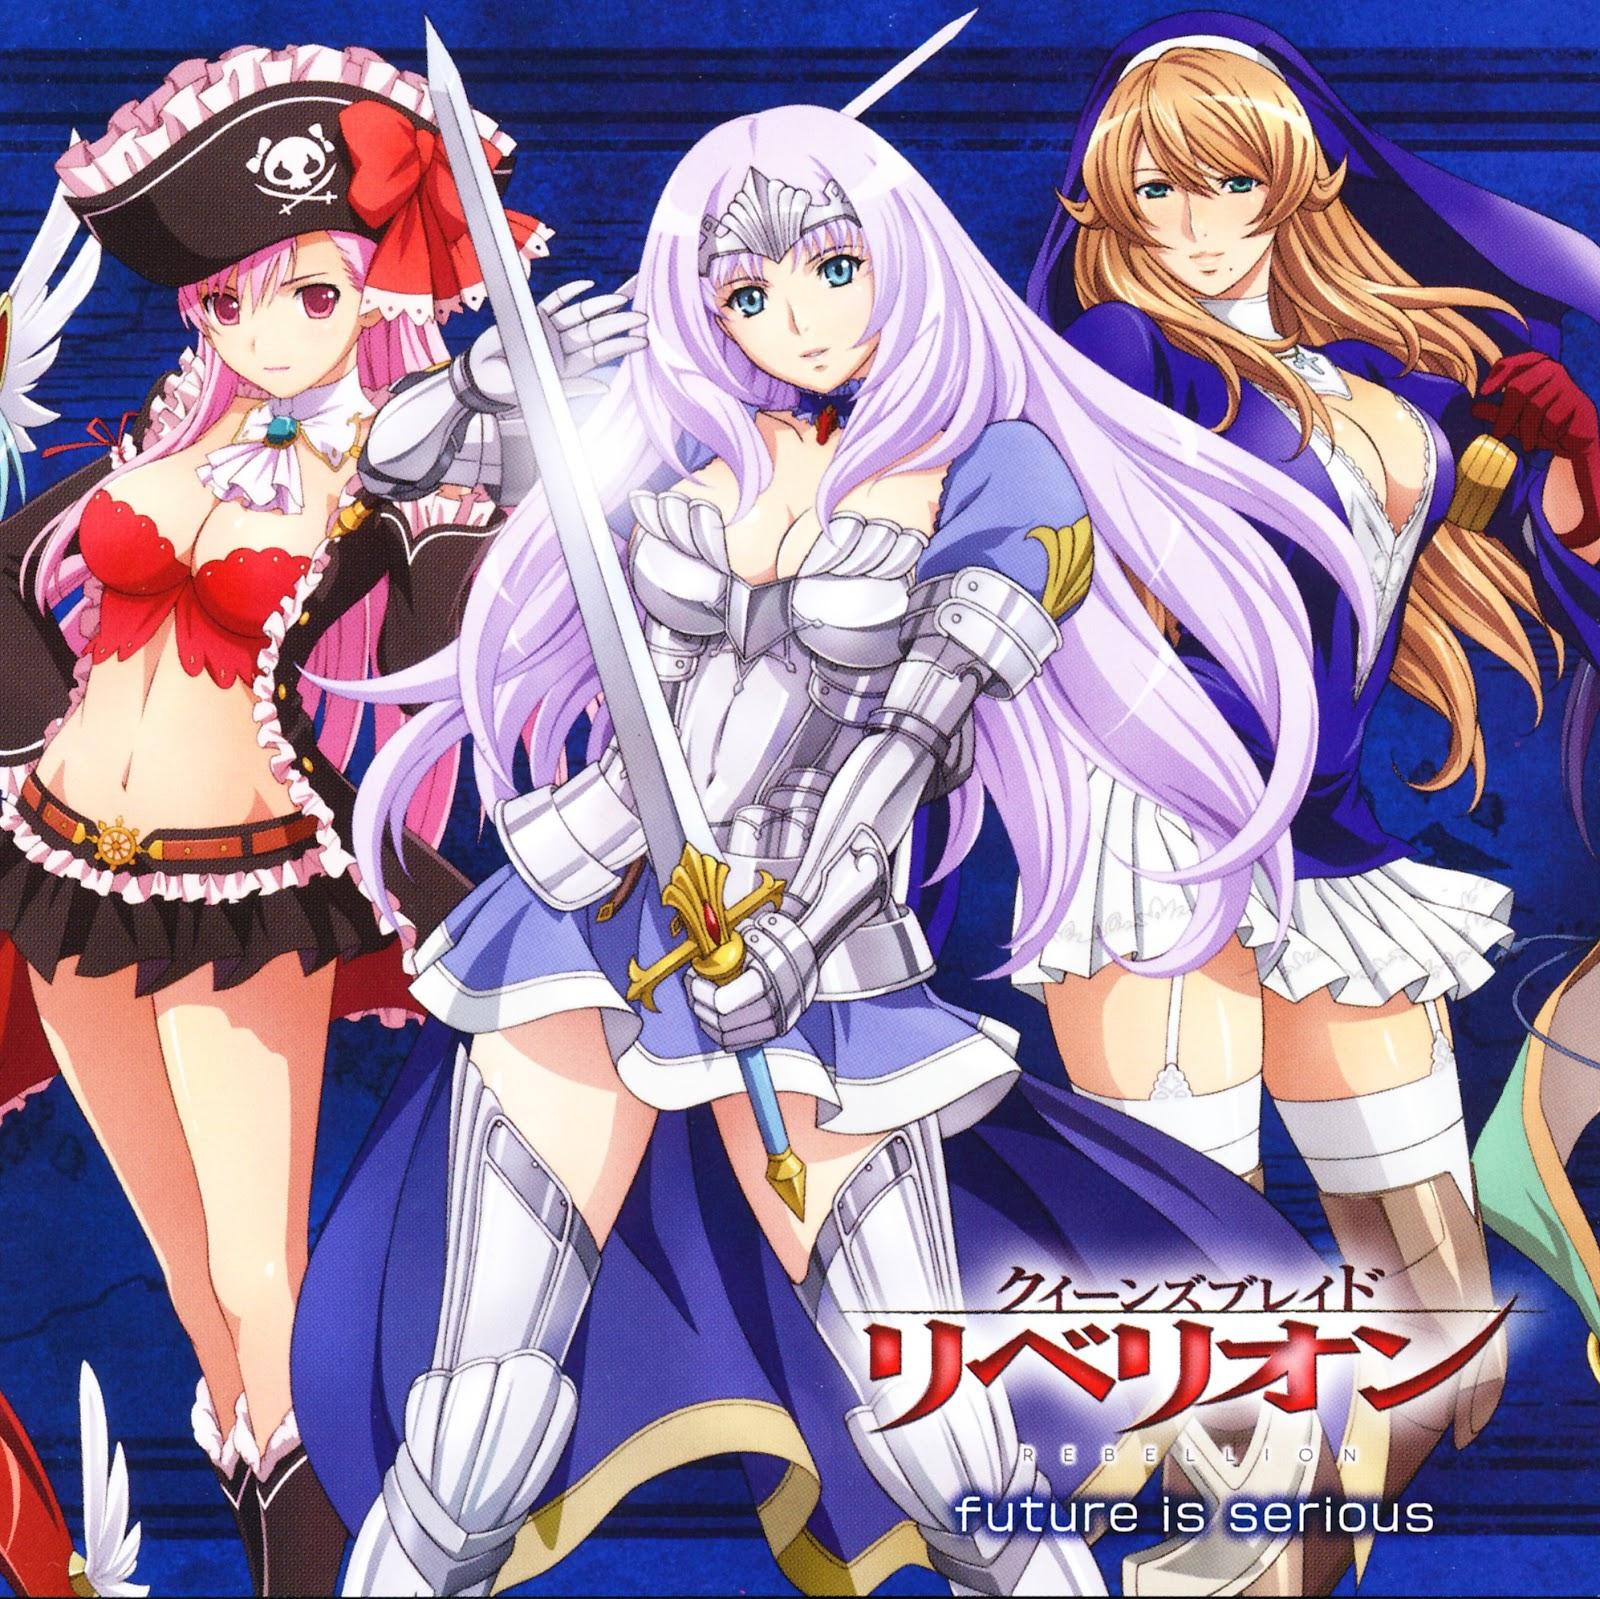 Queen's Blade: Rebellion